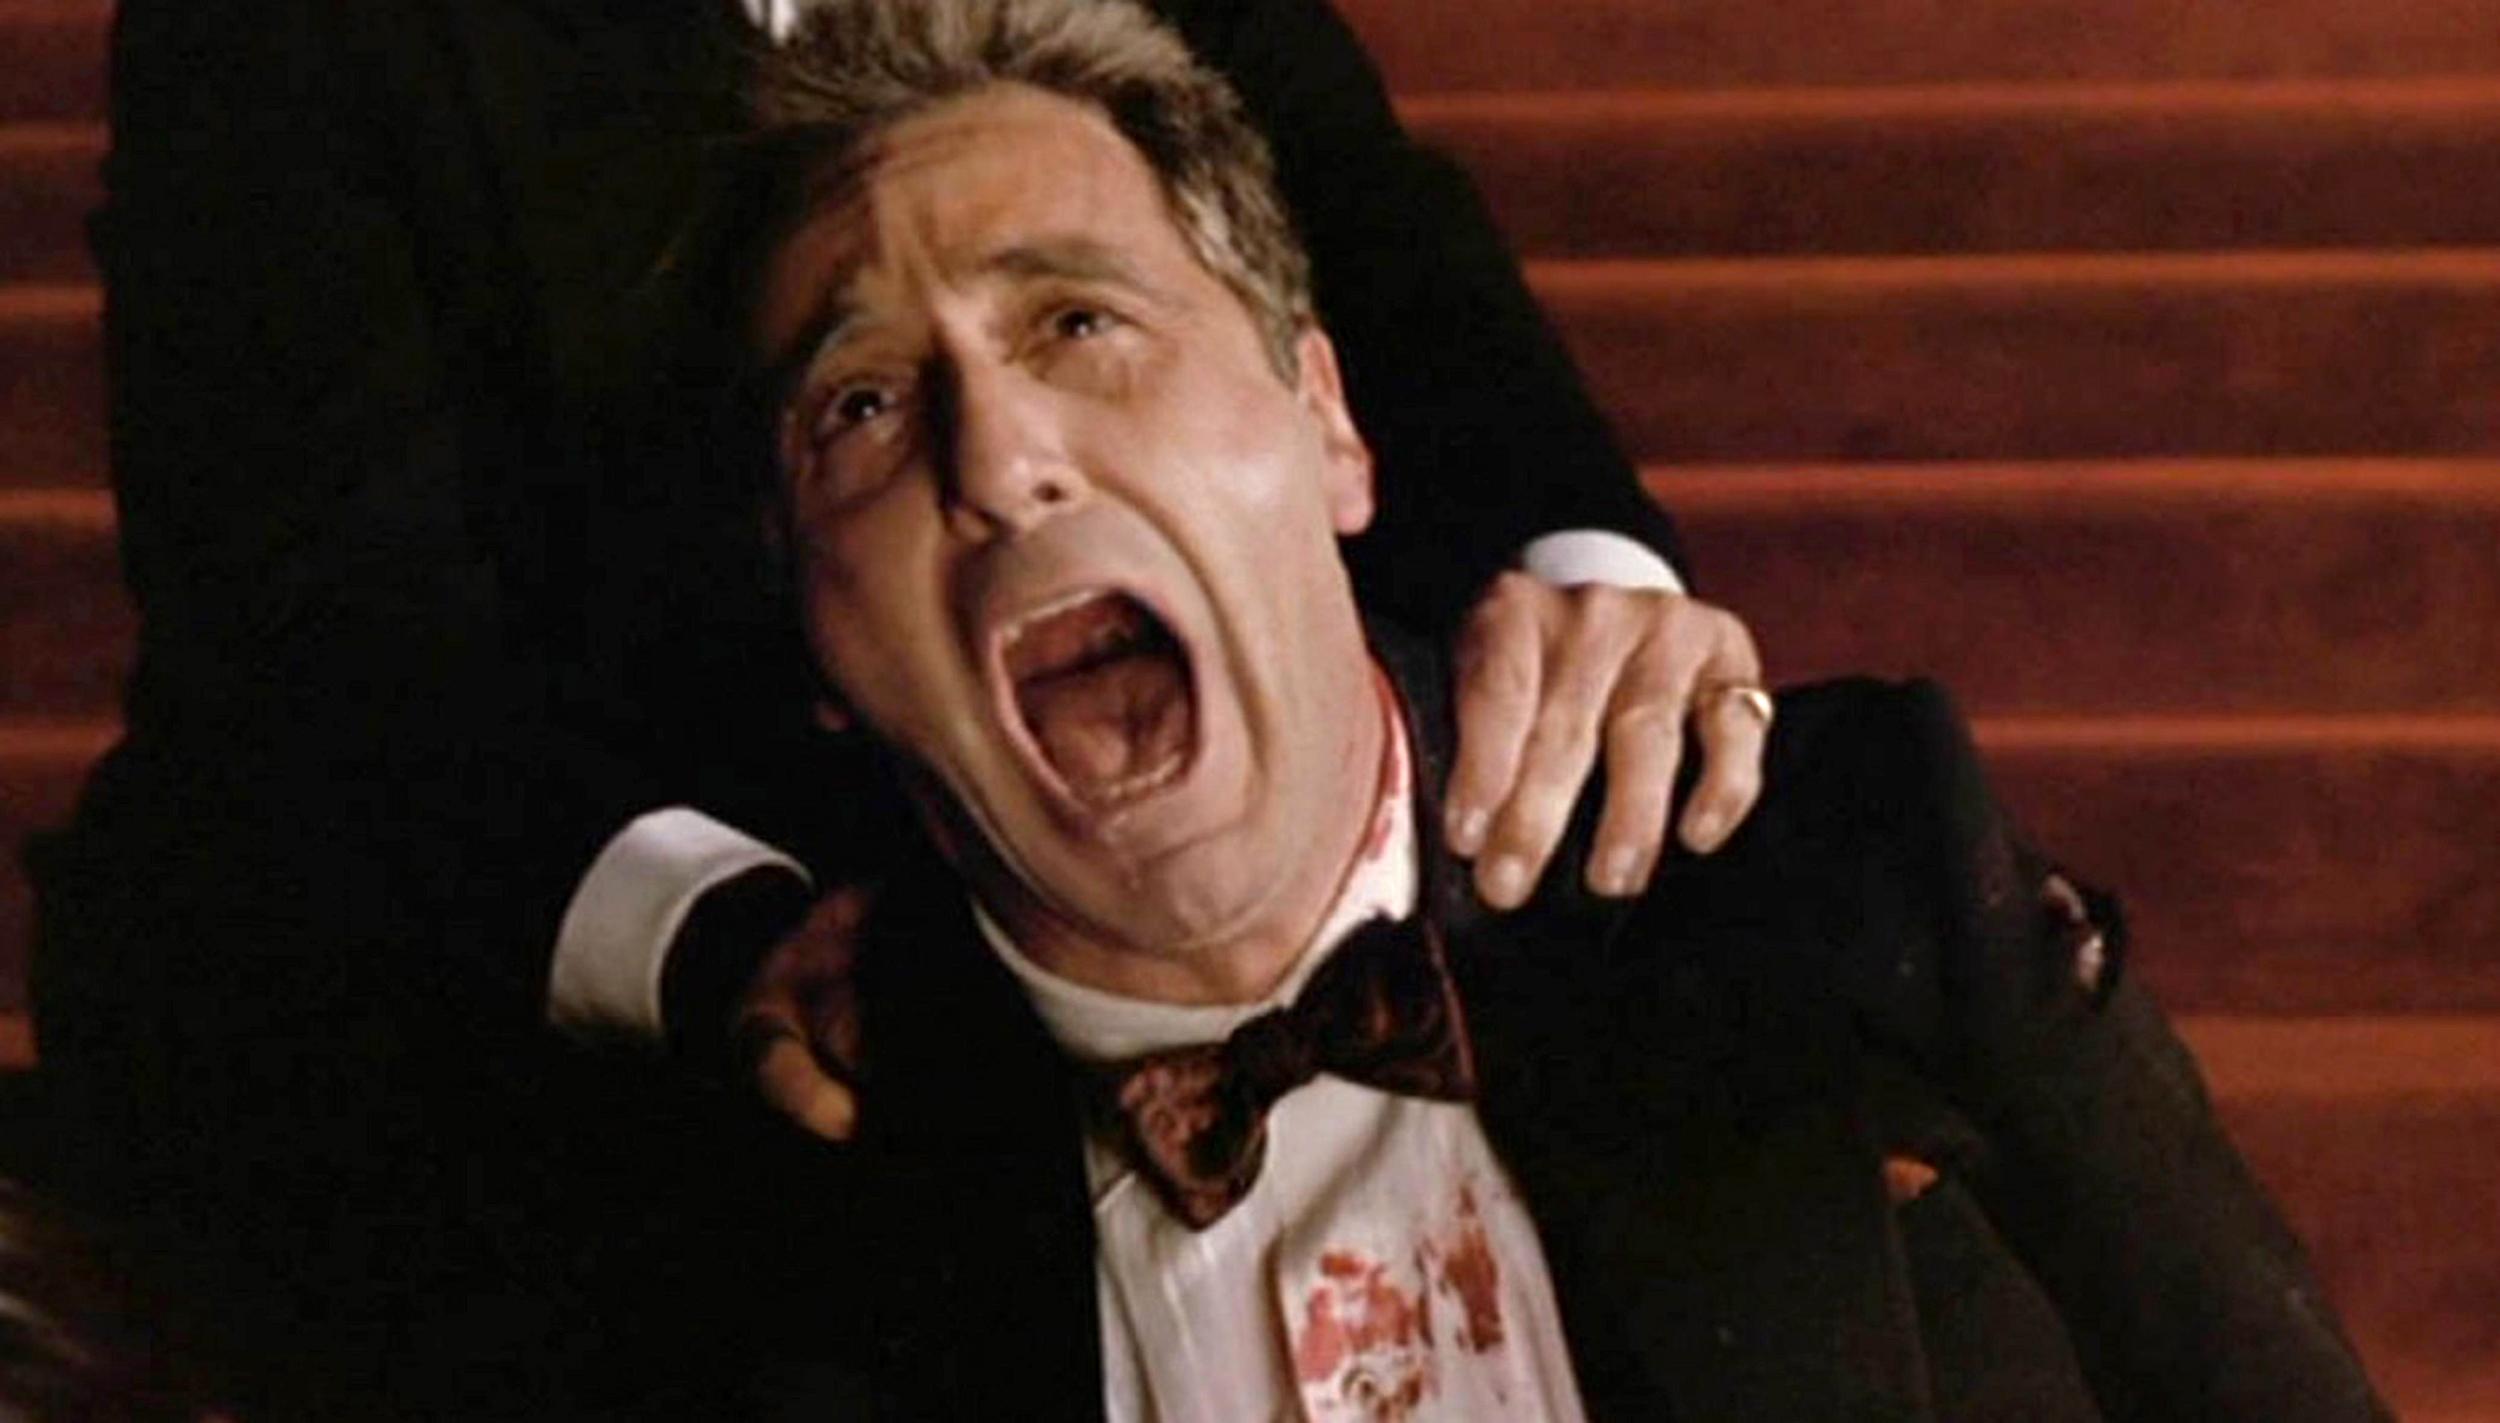 The Godfather Coda : The Death of Michael Corleone - directors cut details